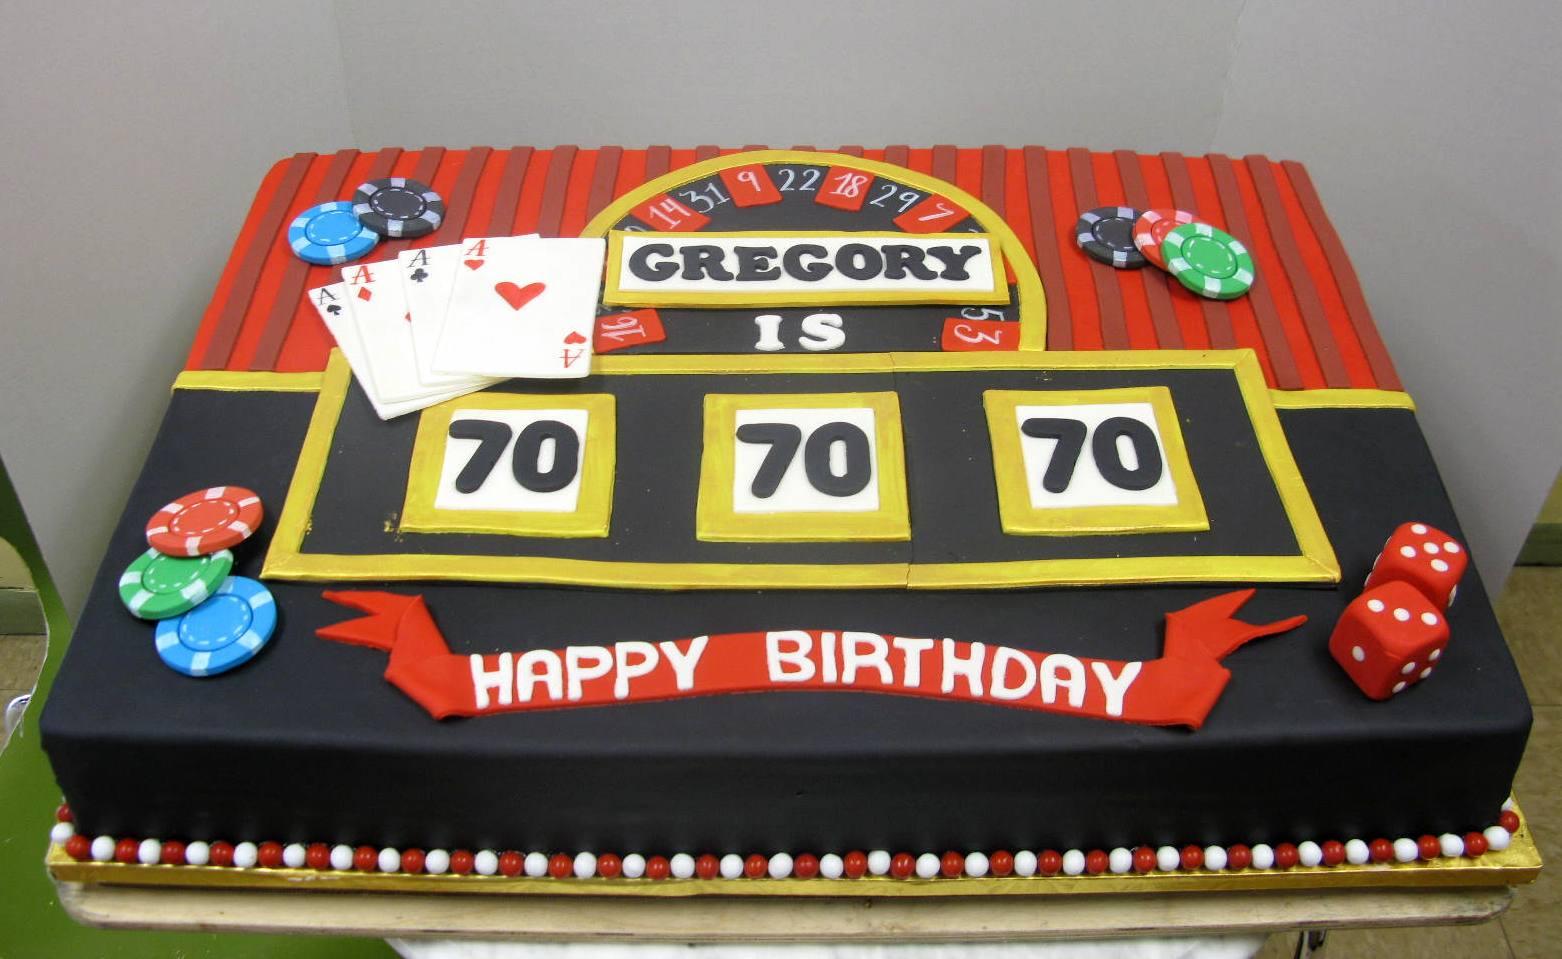 Superb Gambling Casino Mafia Mother Mousse Funny Birthday Cards Online Barepcheapnameinfo